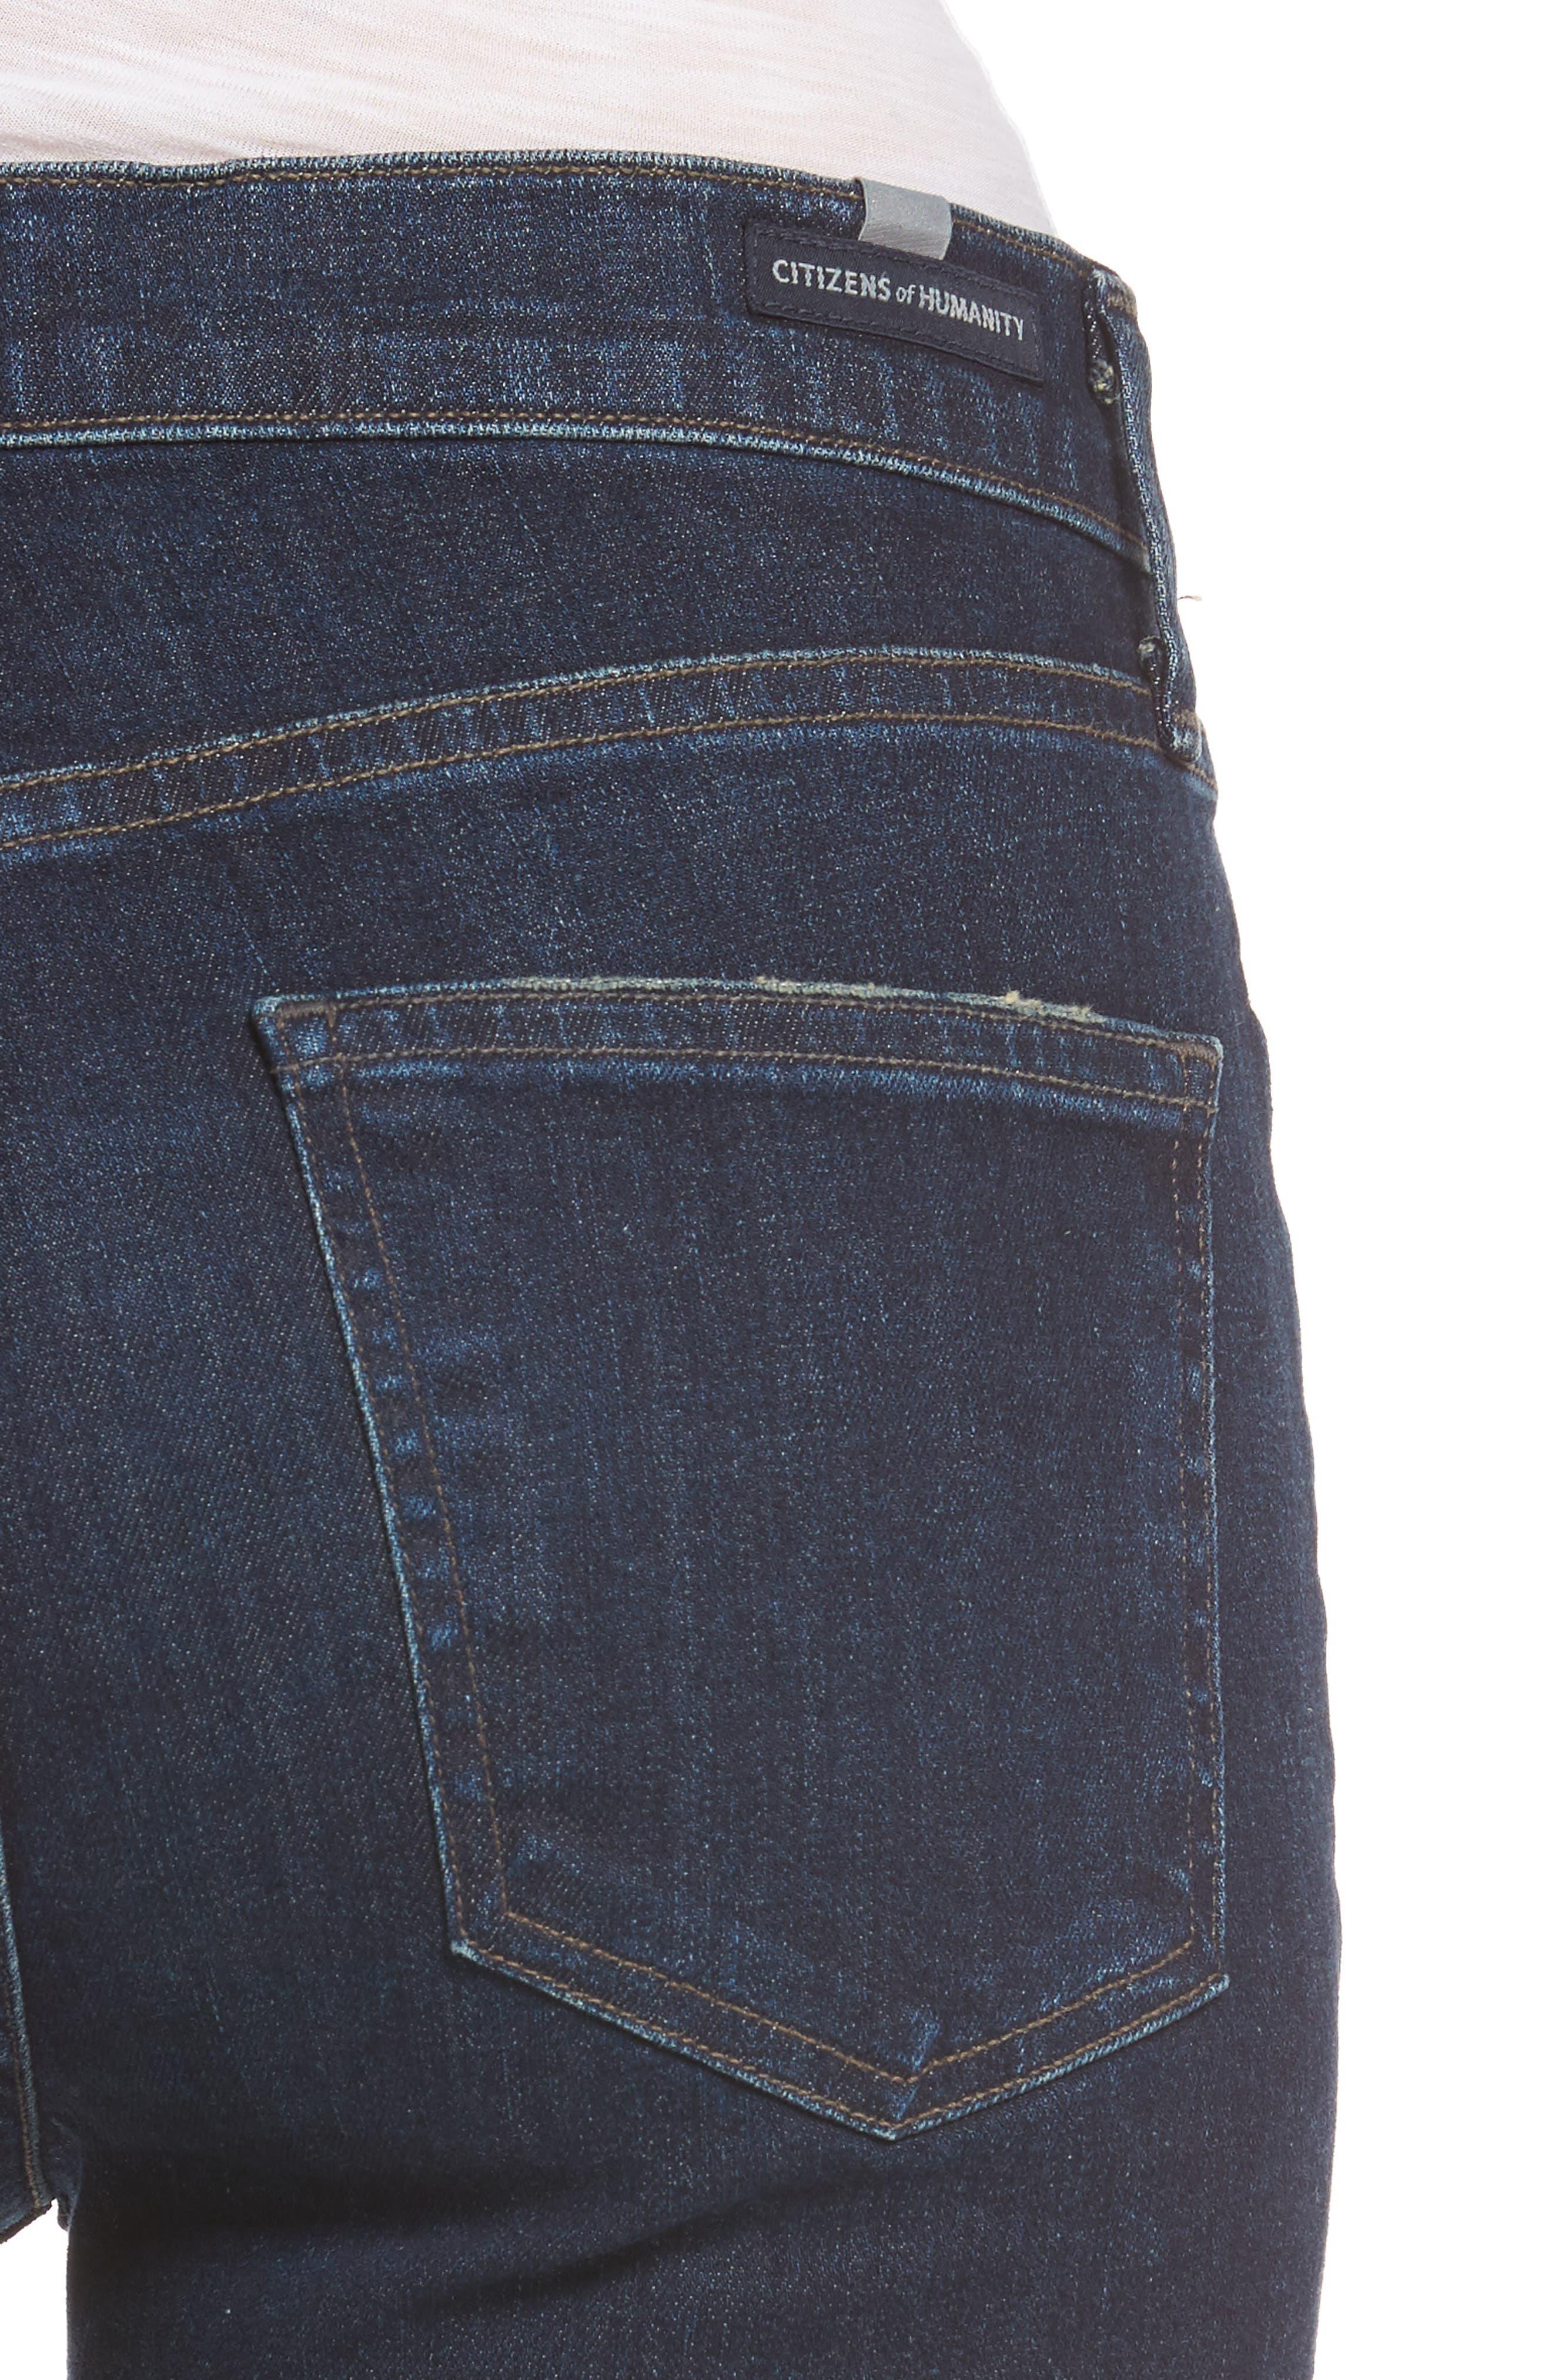 Cara Ankle Cigarette Jeans,                             Alternate thumbnail 4, color,                             401